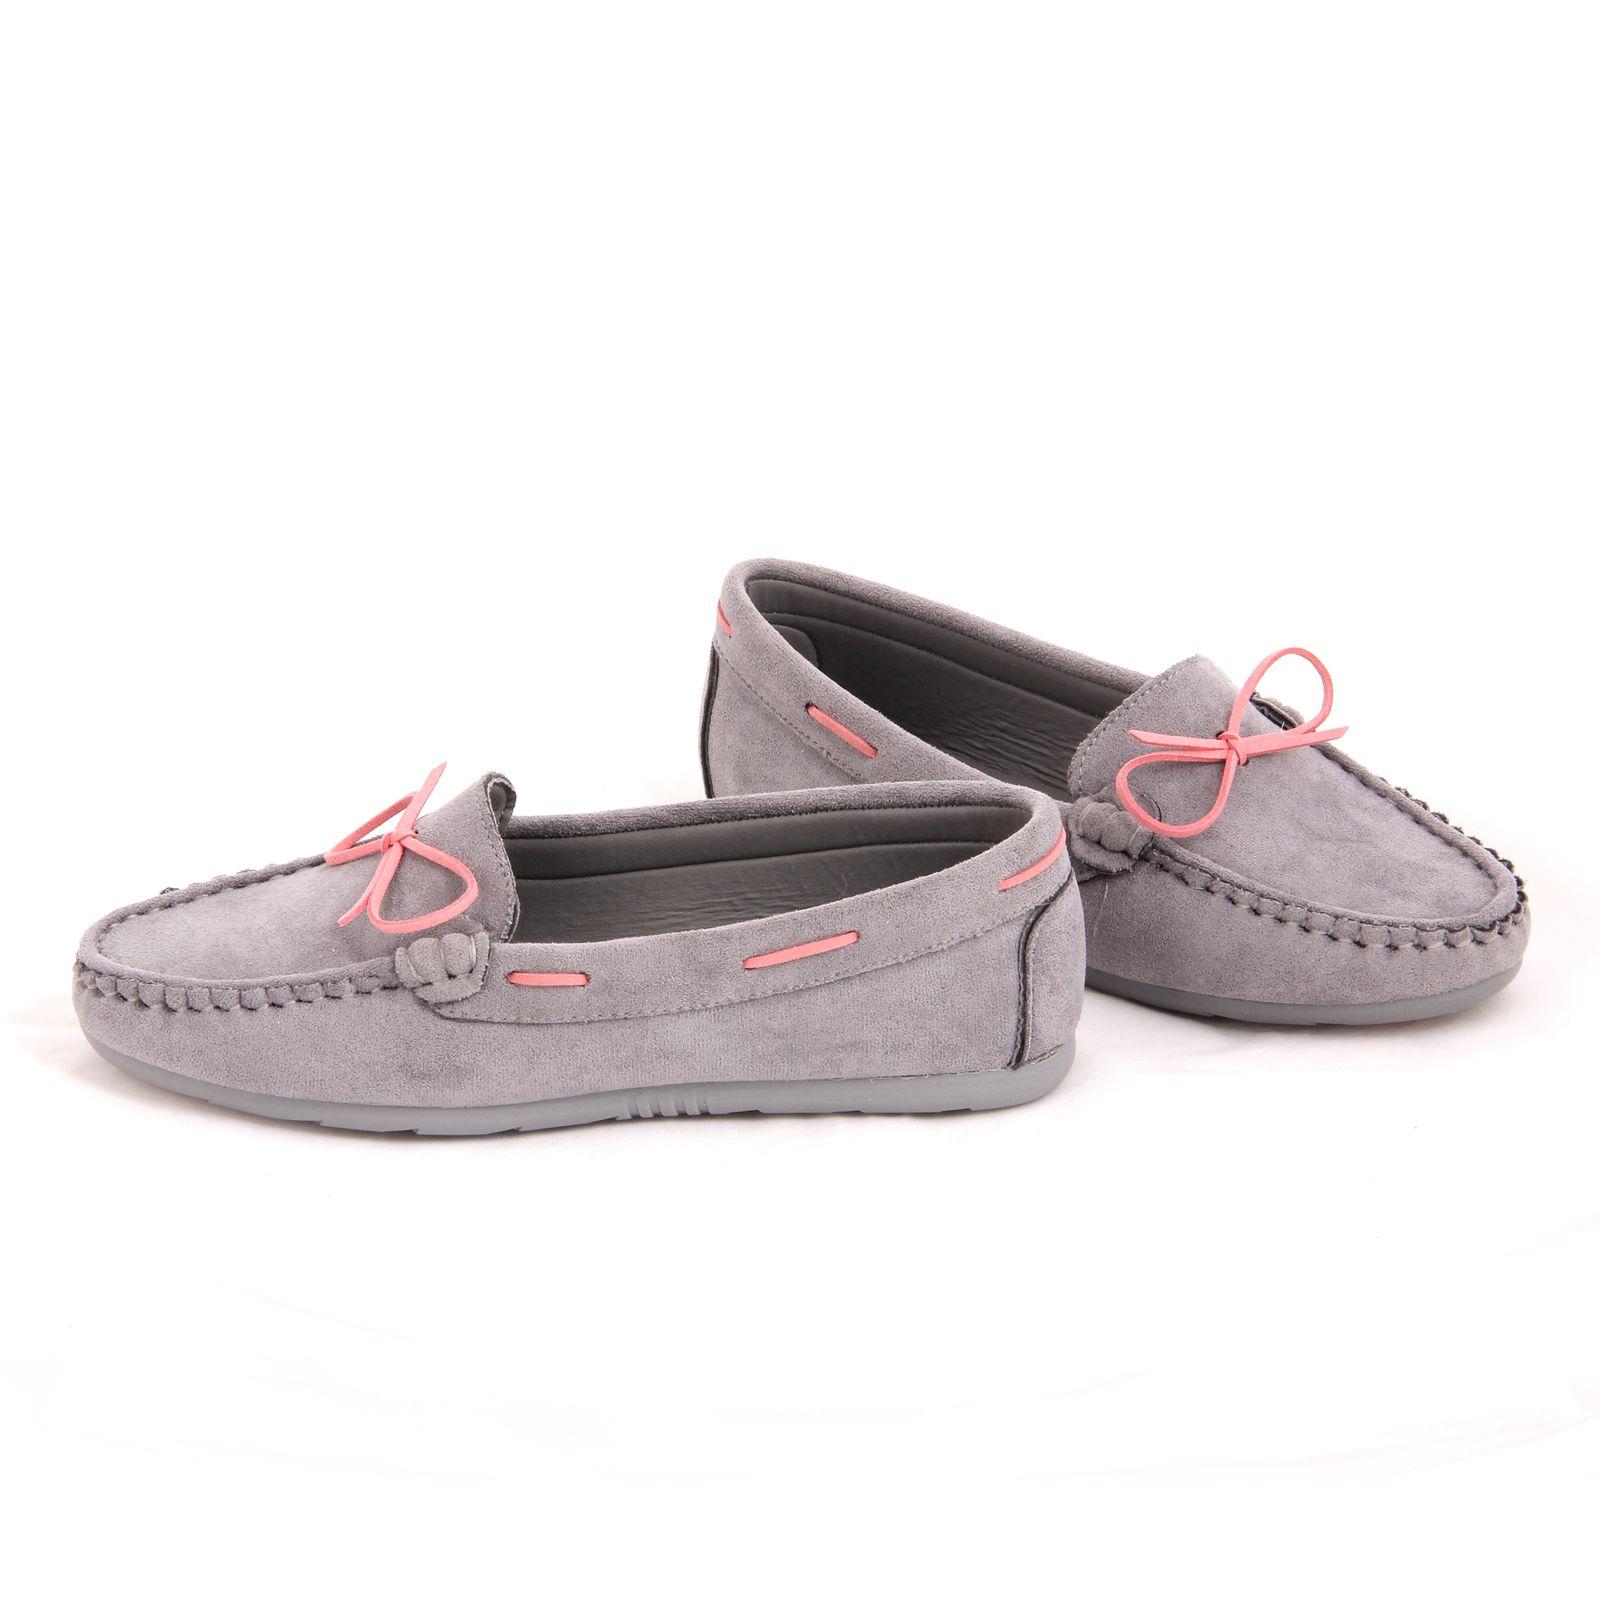 کفش روزمره زنانه کد 395 main 1 3